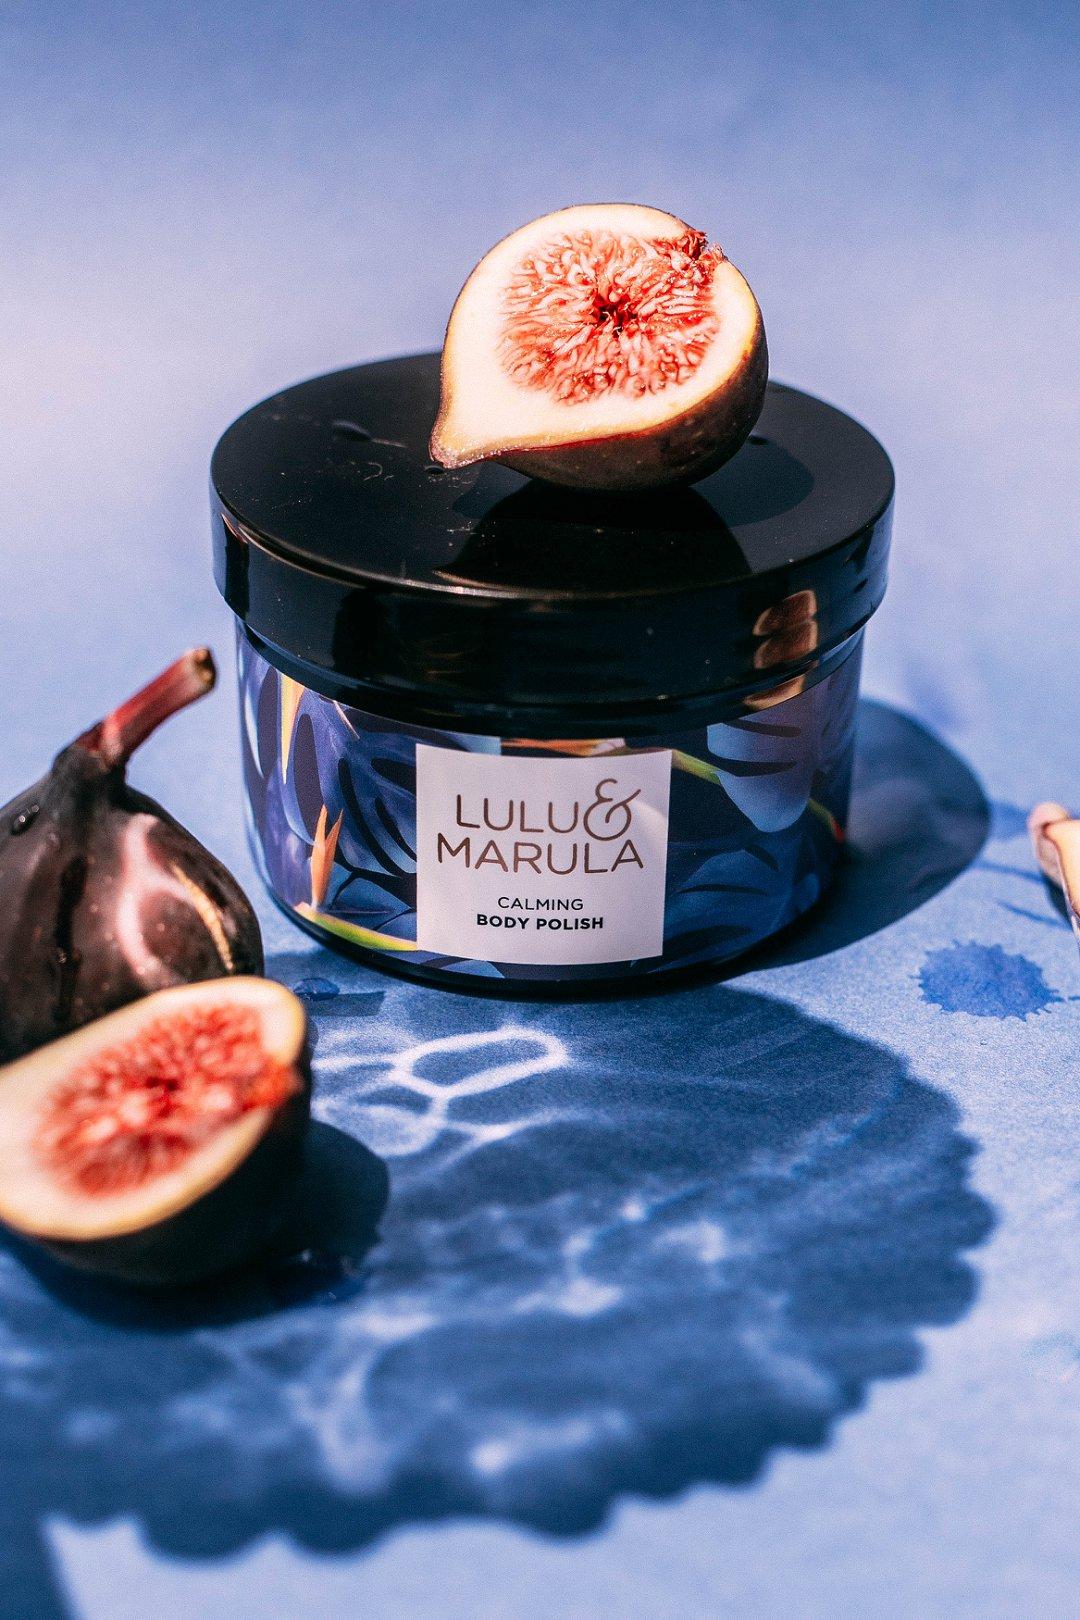 Lulu & Marula - Skincare That Works